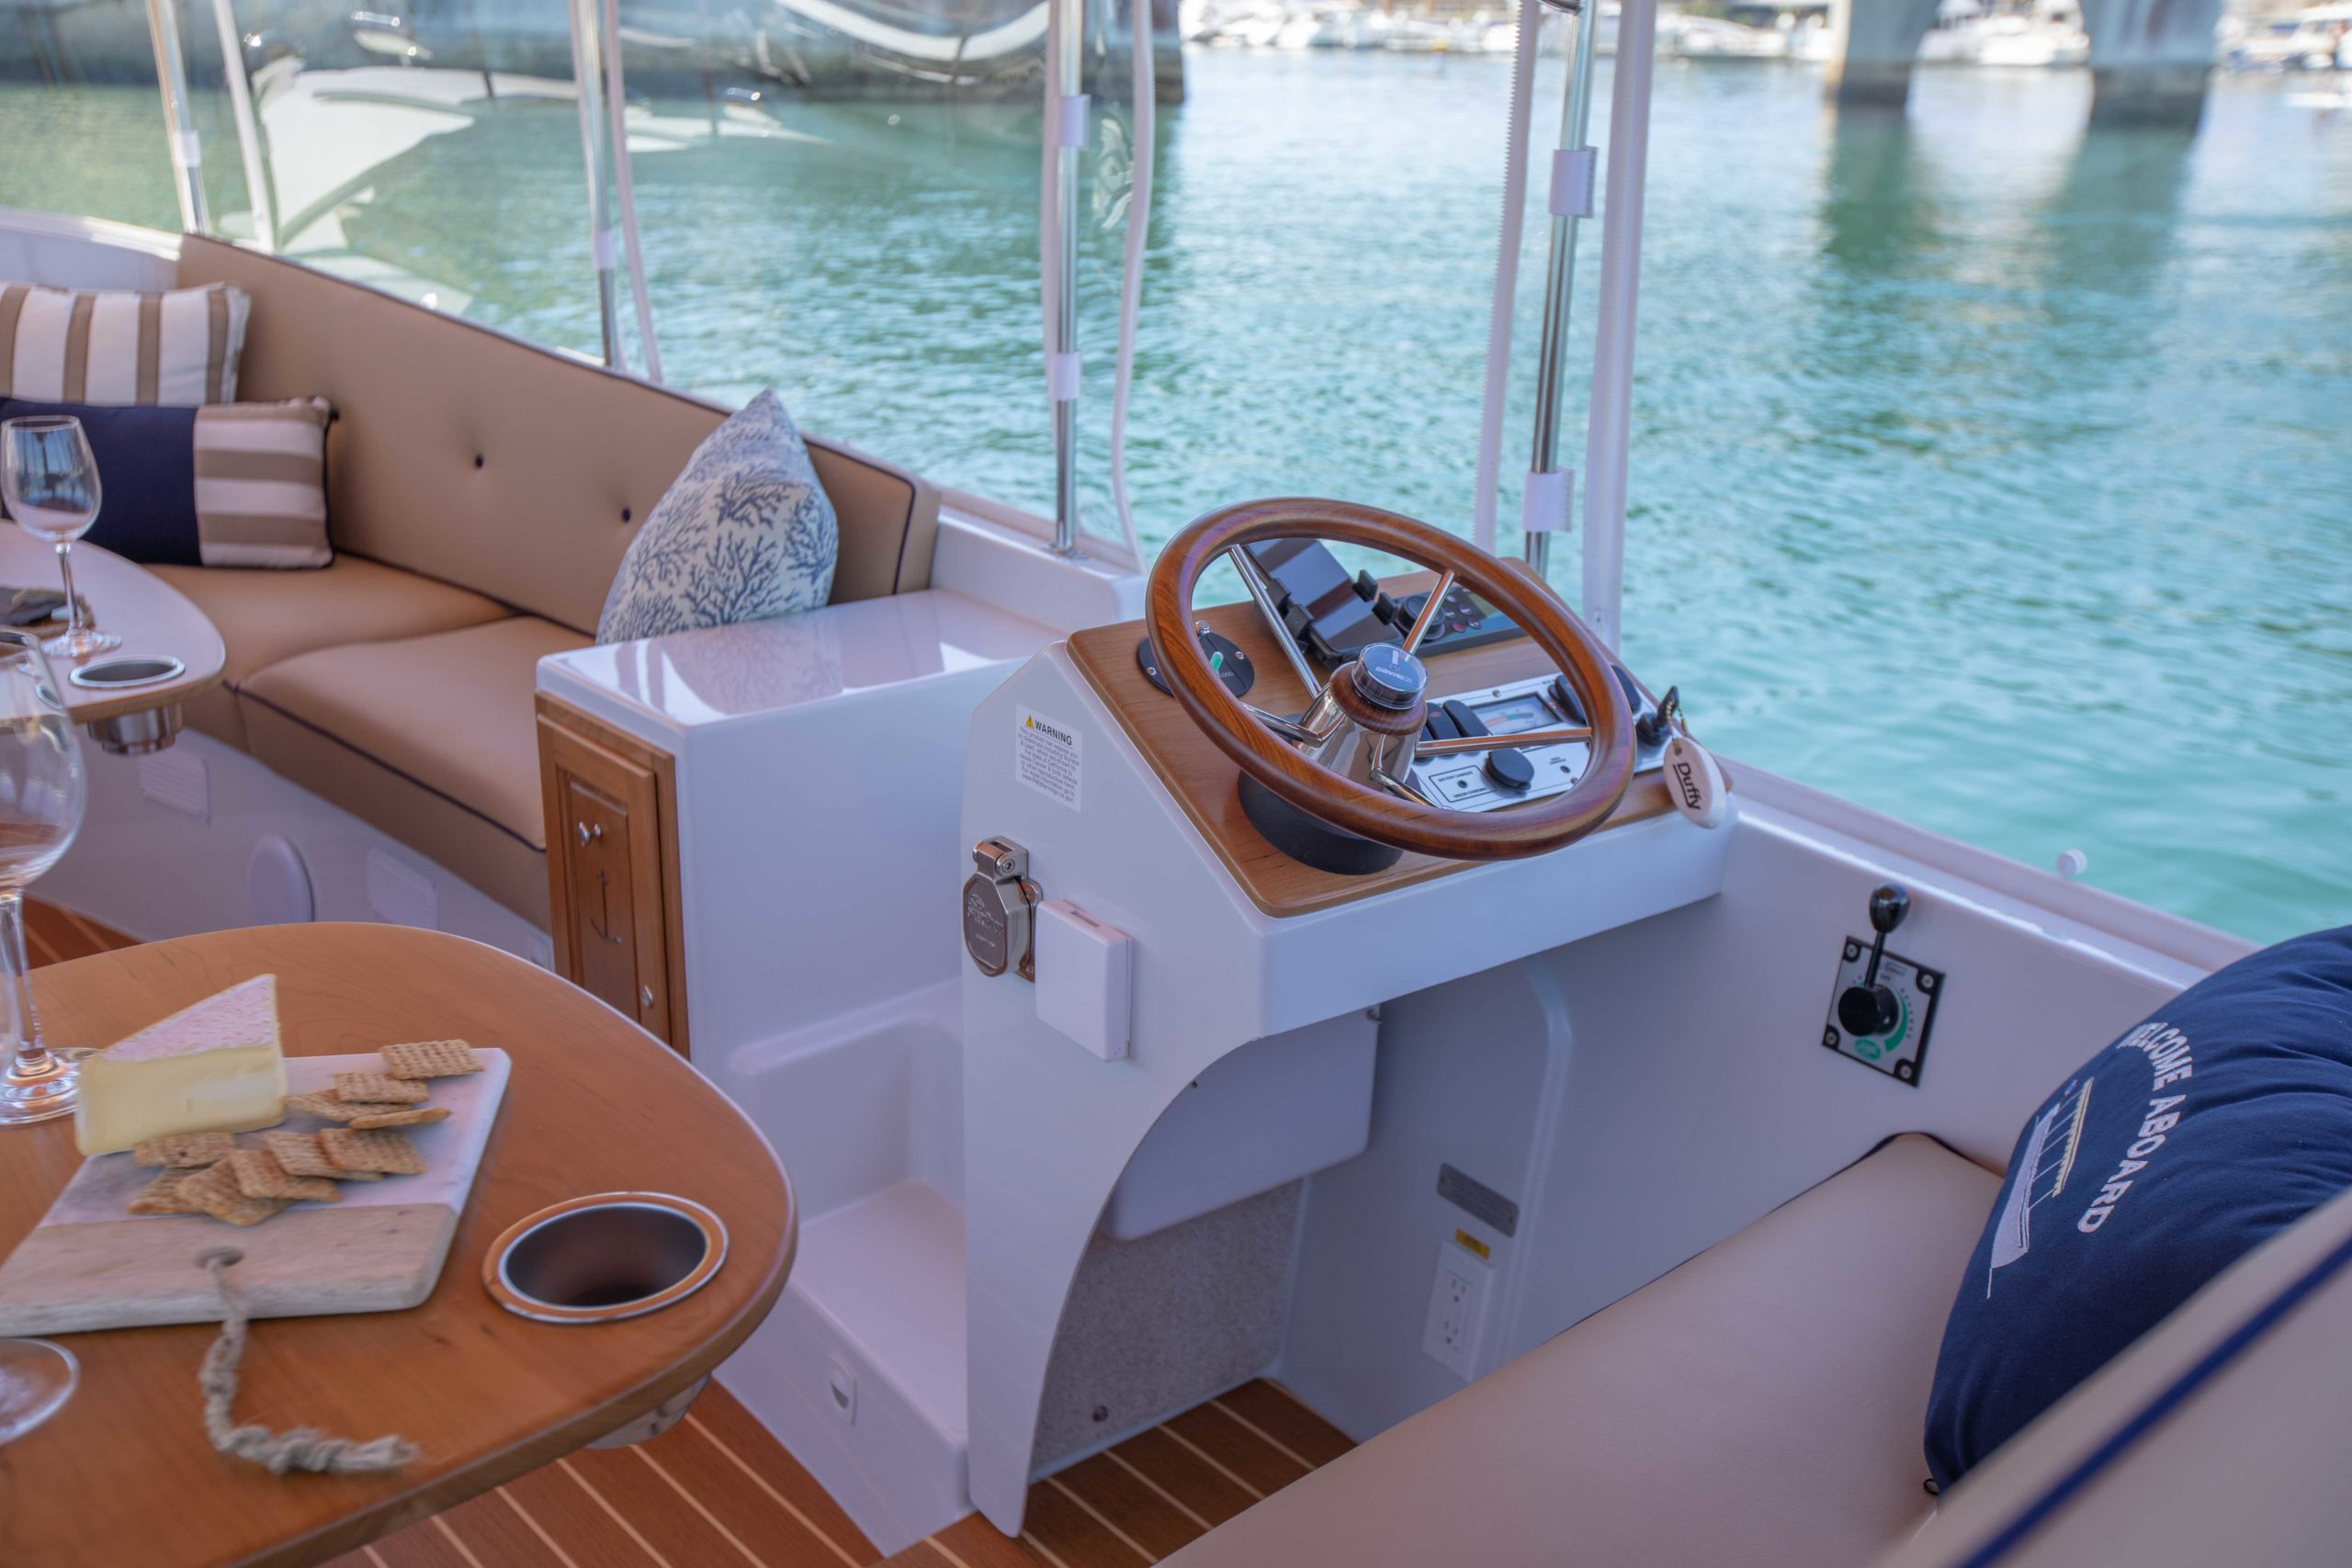 Duffy-Electric-Boats-22-Cuddy-Cabin-Interior-4